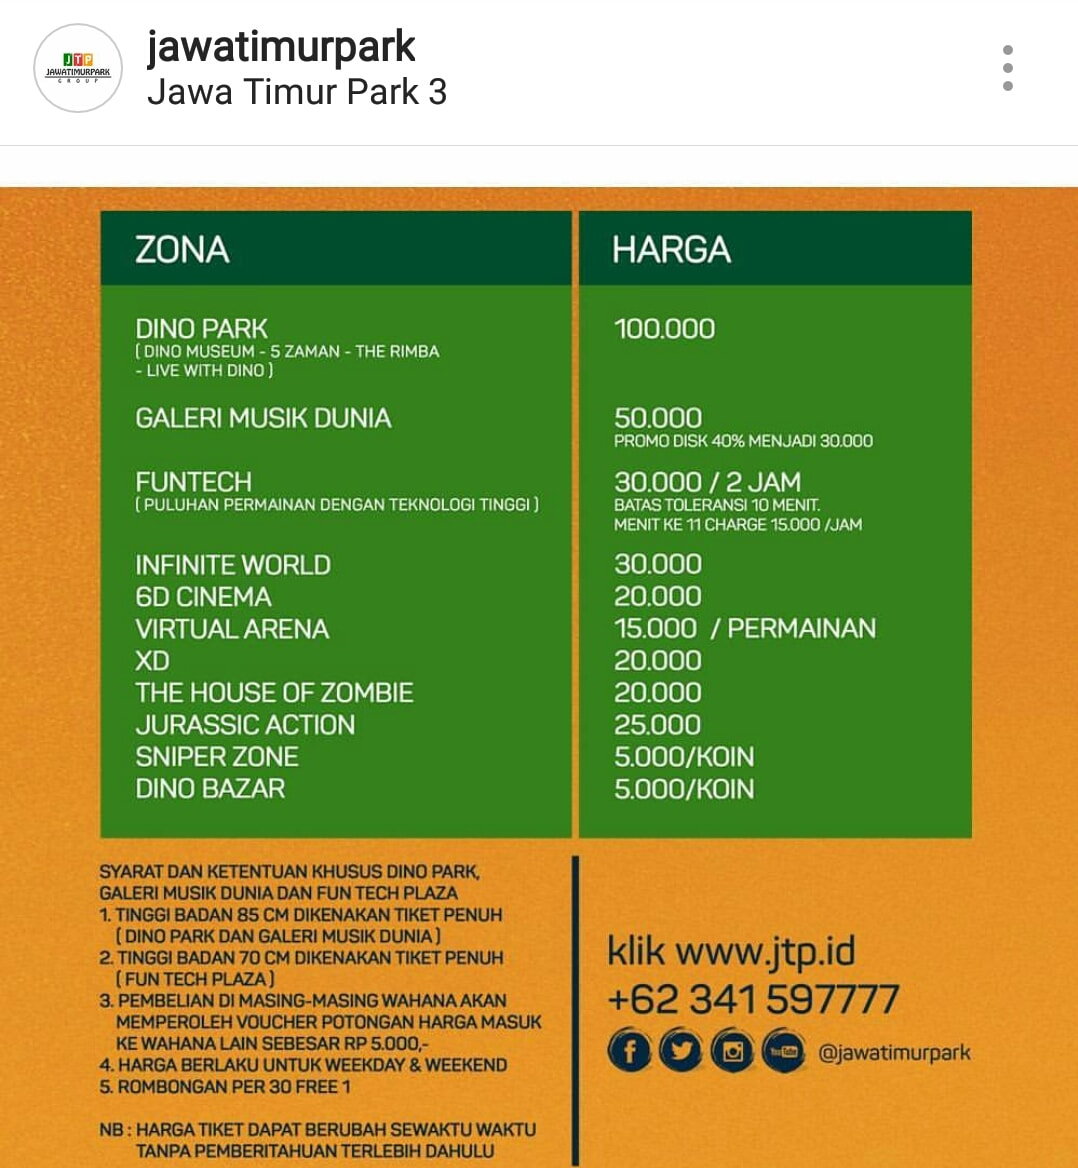 Wahana Jatim Park 3 Kota Batu Dan Harga Tiket Masuk Terbaru